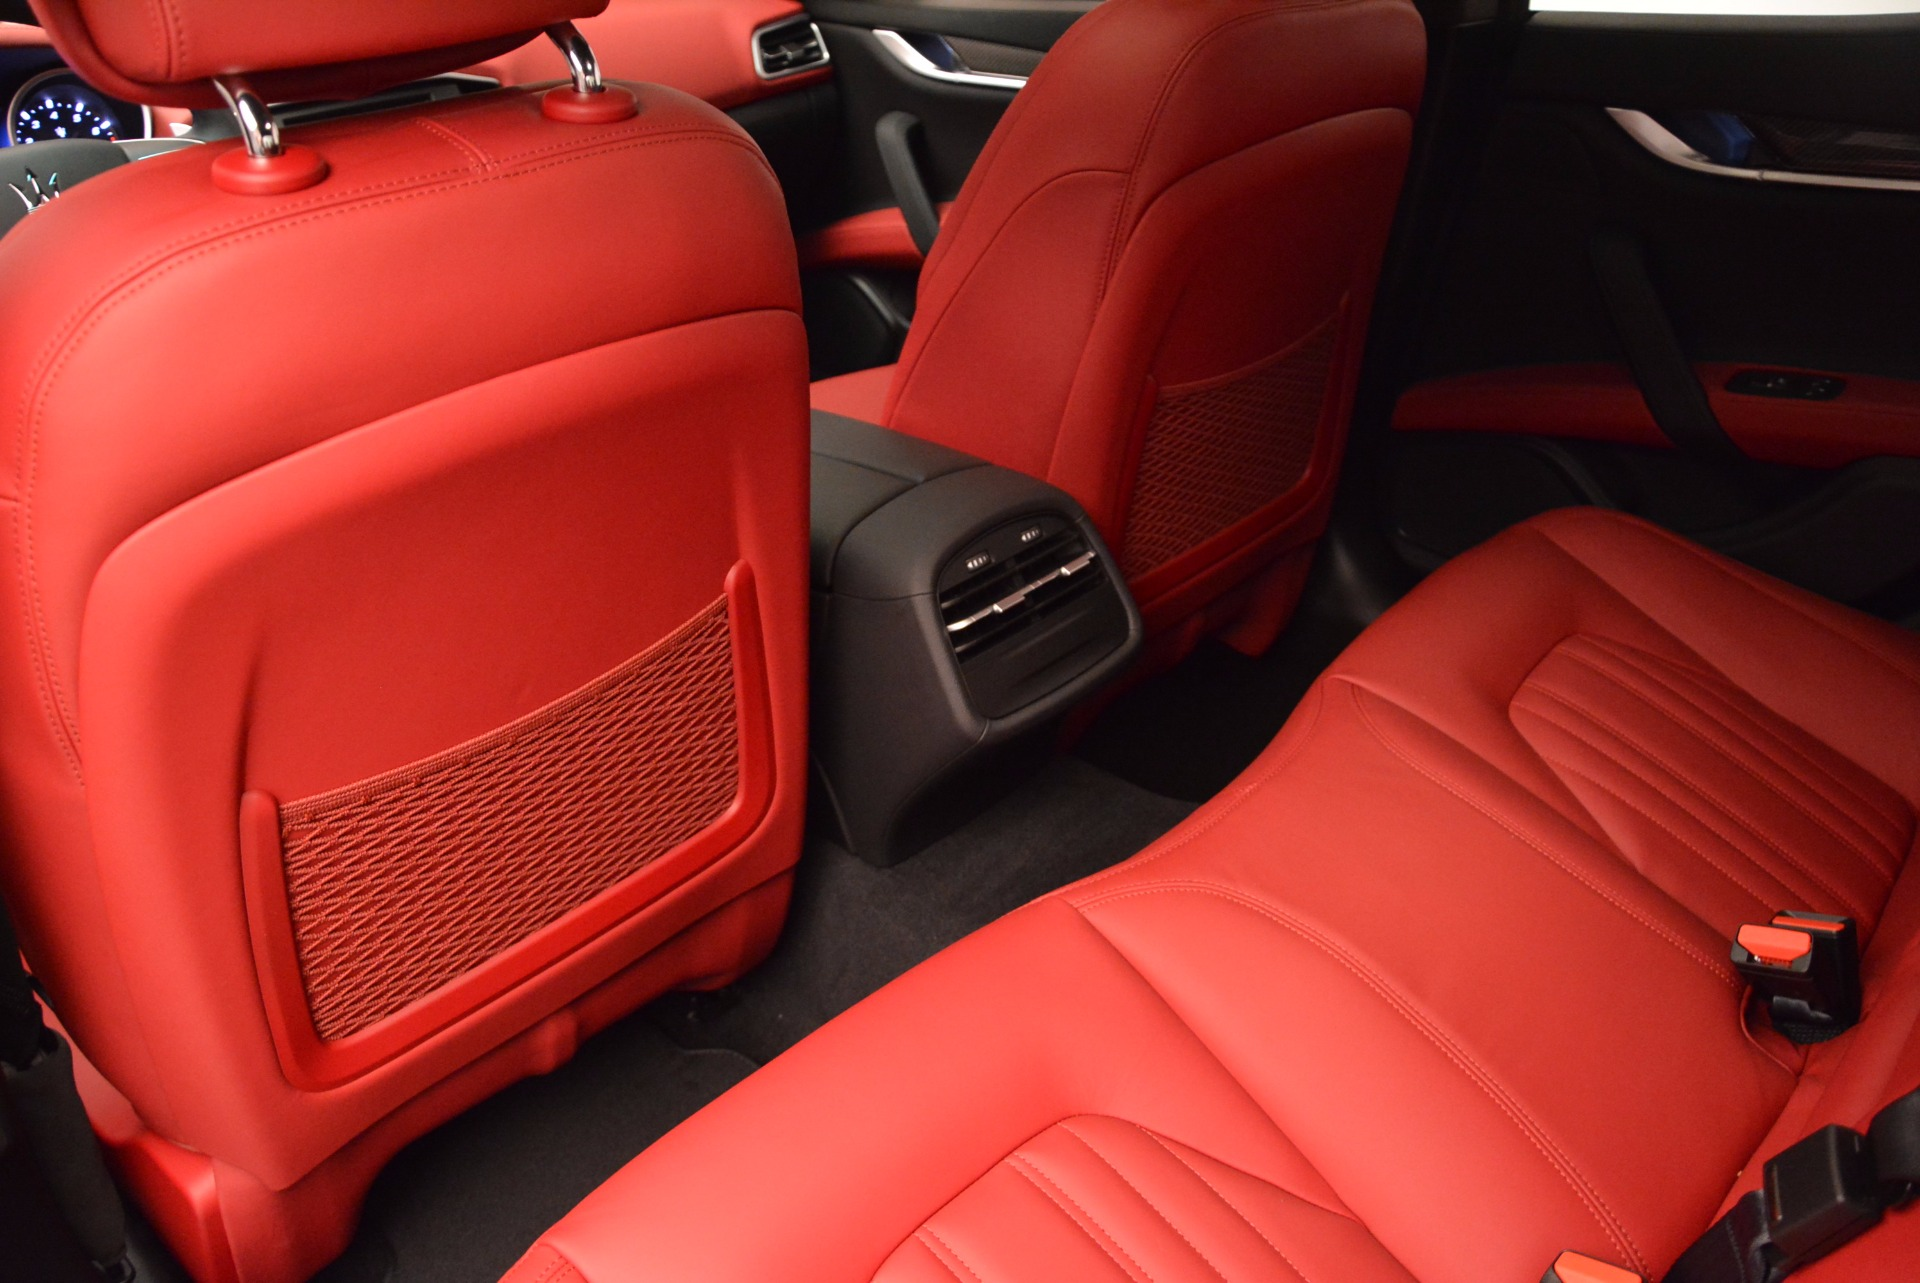 Used 2015 Maserati Ghibli S Q4 For Sale In Westport, CT 1290_p17